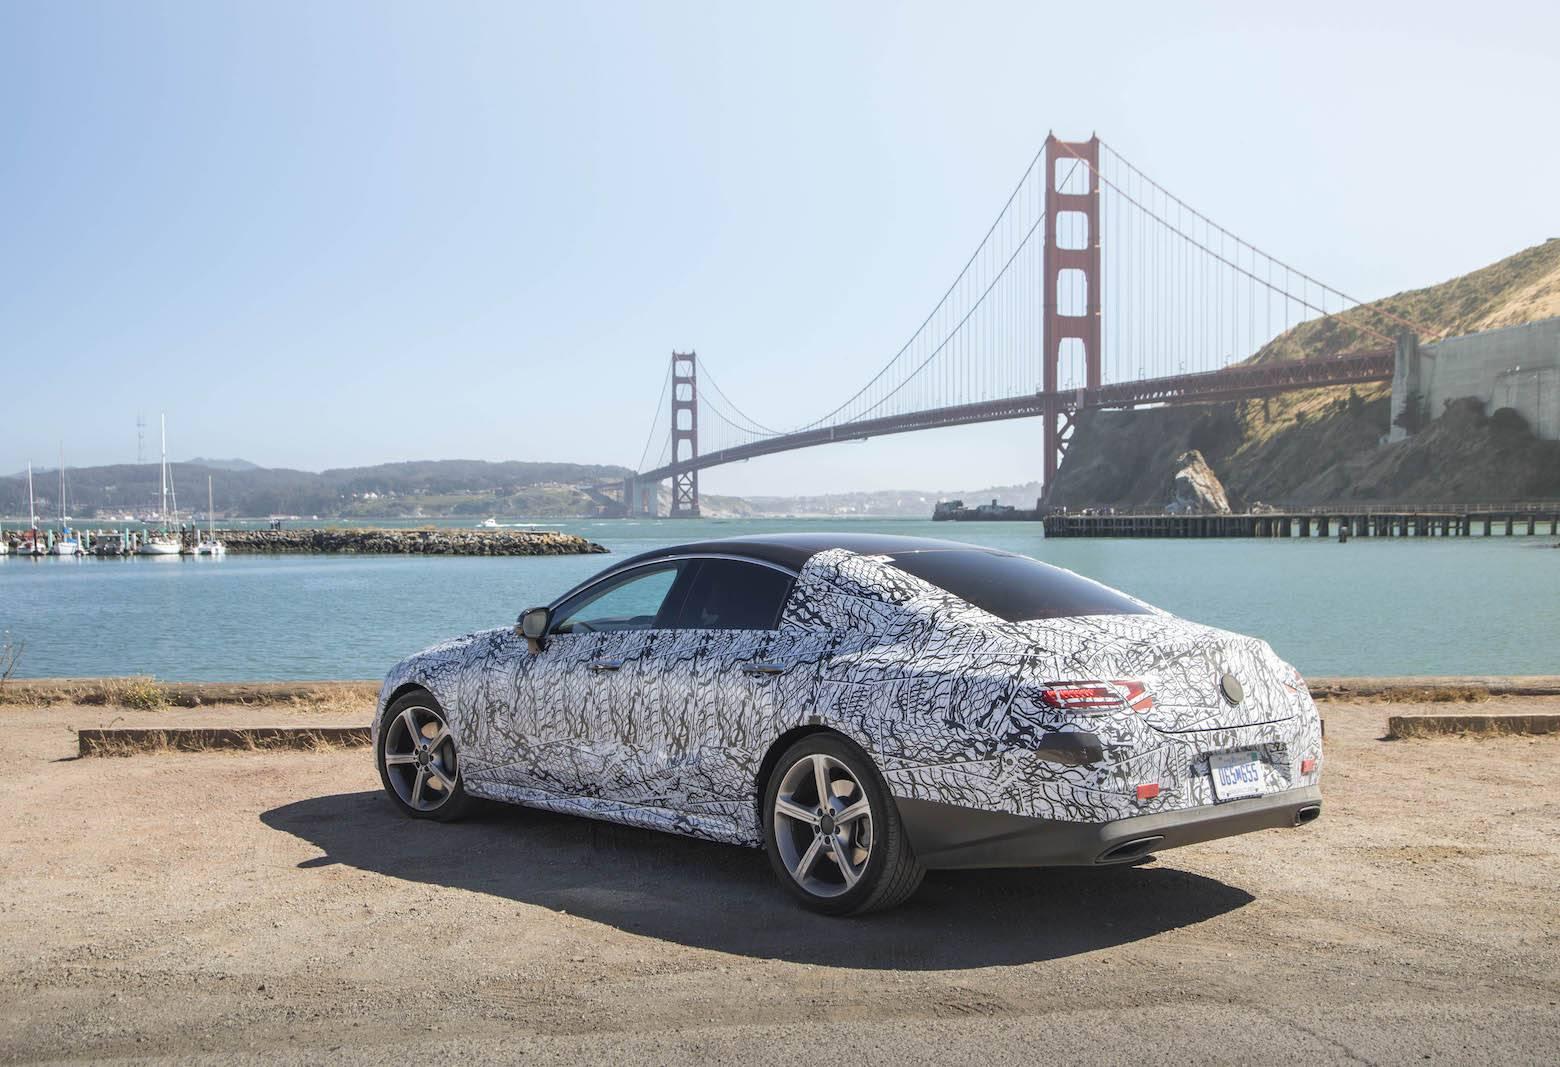 2018 Mercedes-Benz CLS Sneak-Peek in San Fransisco - GTspirit